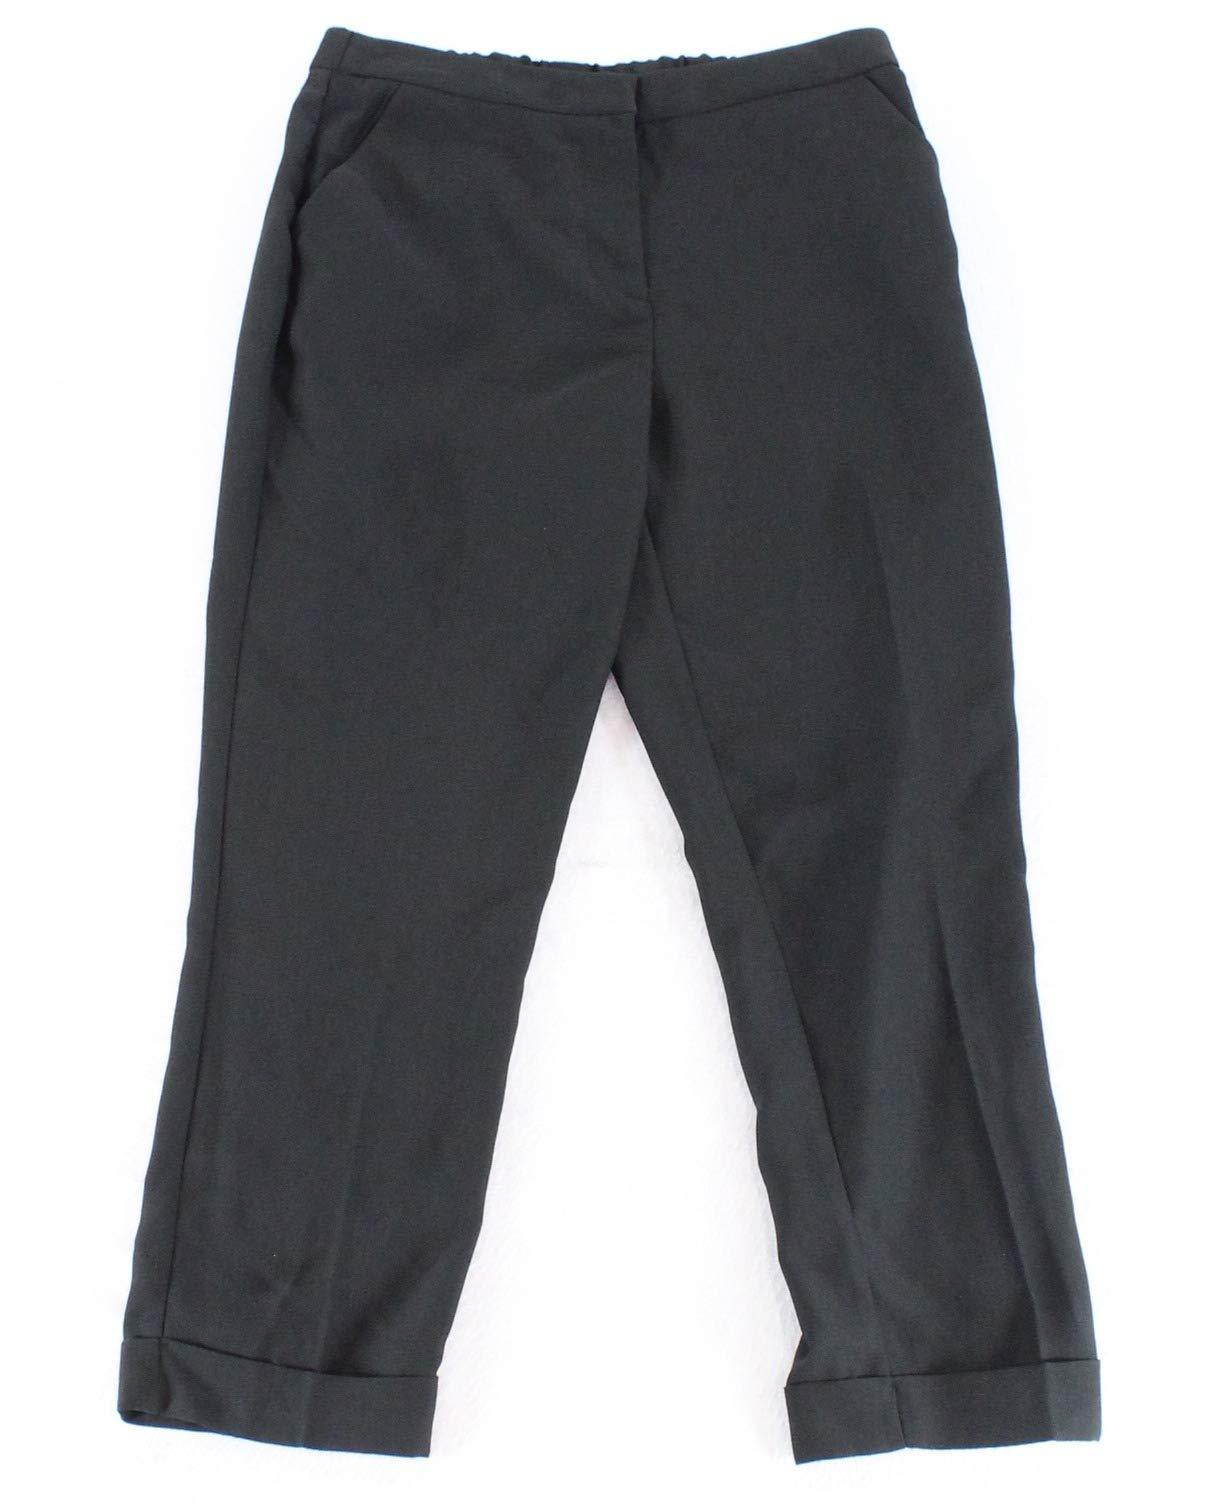 XOXO Solid Women's Medium Cuffed Hem Dress Pants Black M